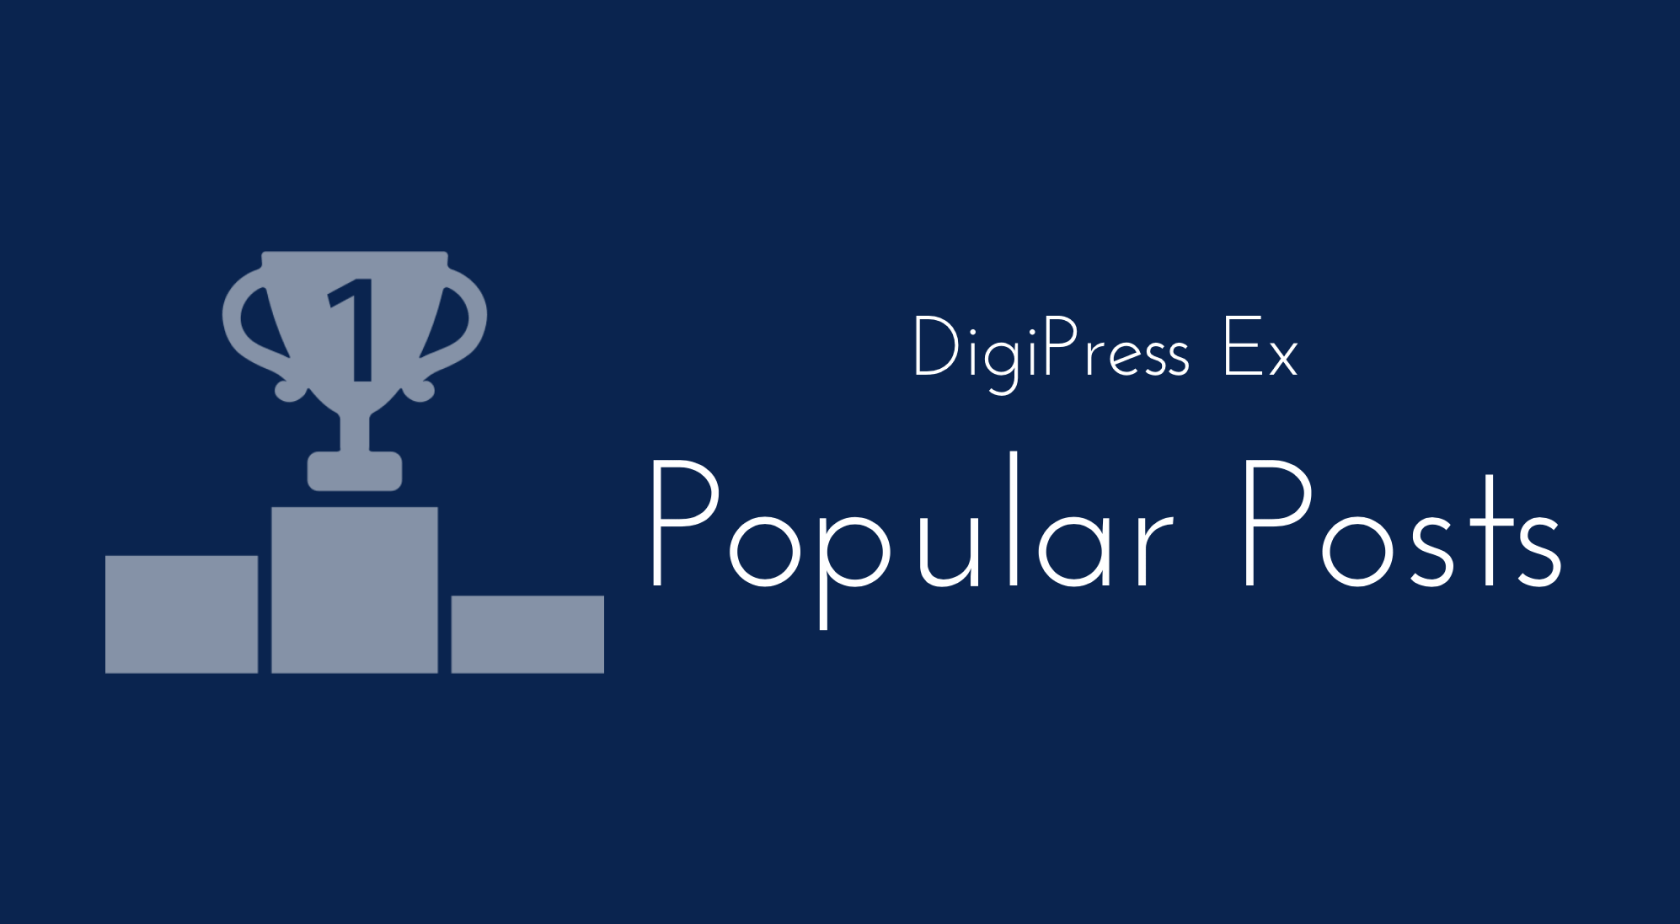 DigiPress Ex - Popular Posts - 日次、週次、月次で表示回数を集計して人気記事を表示